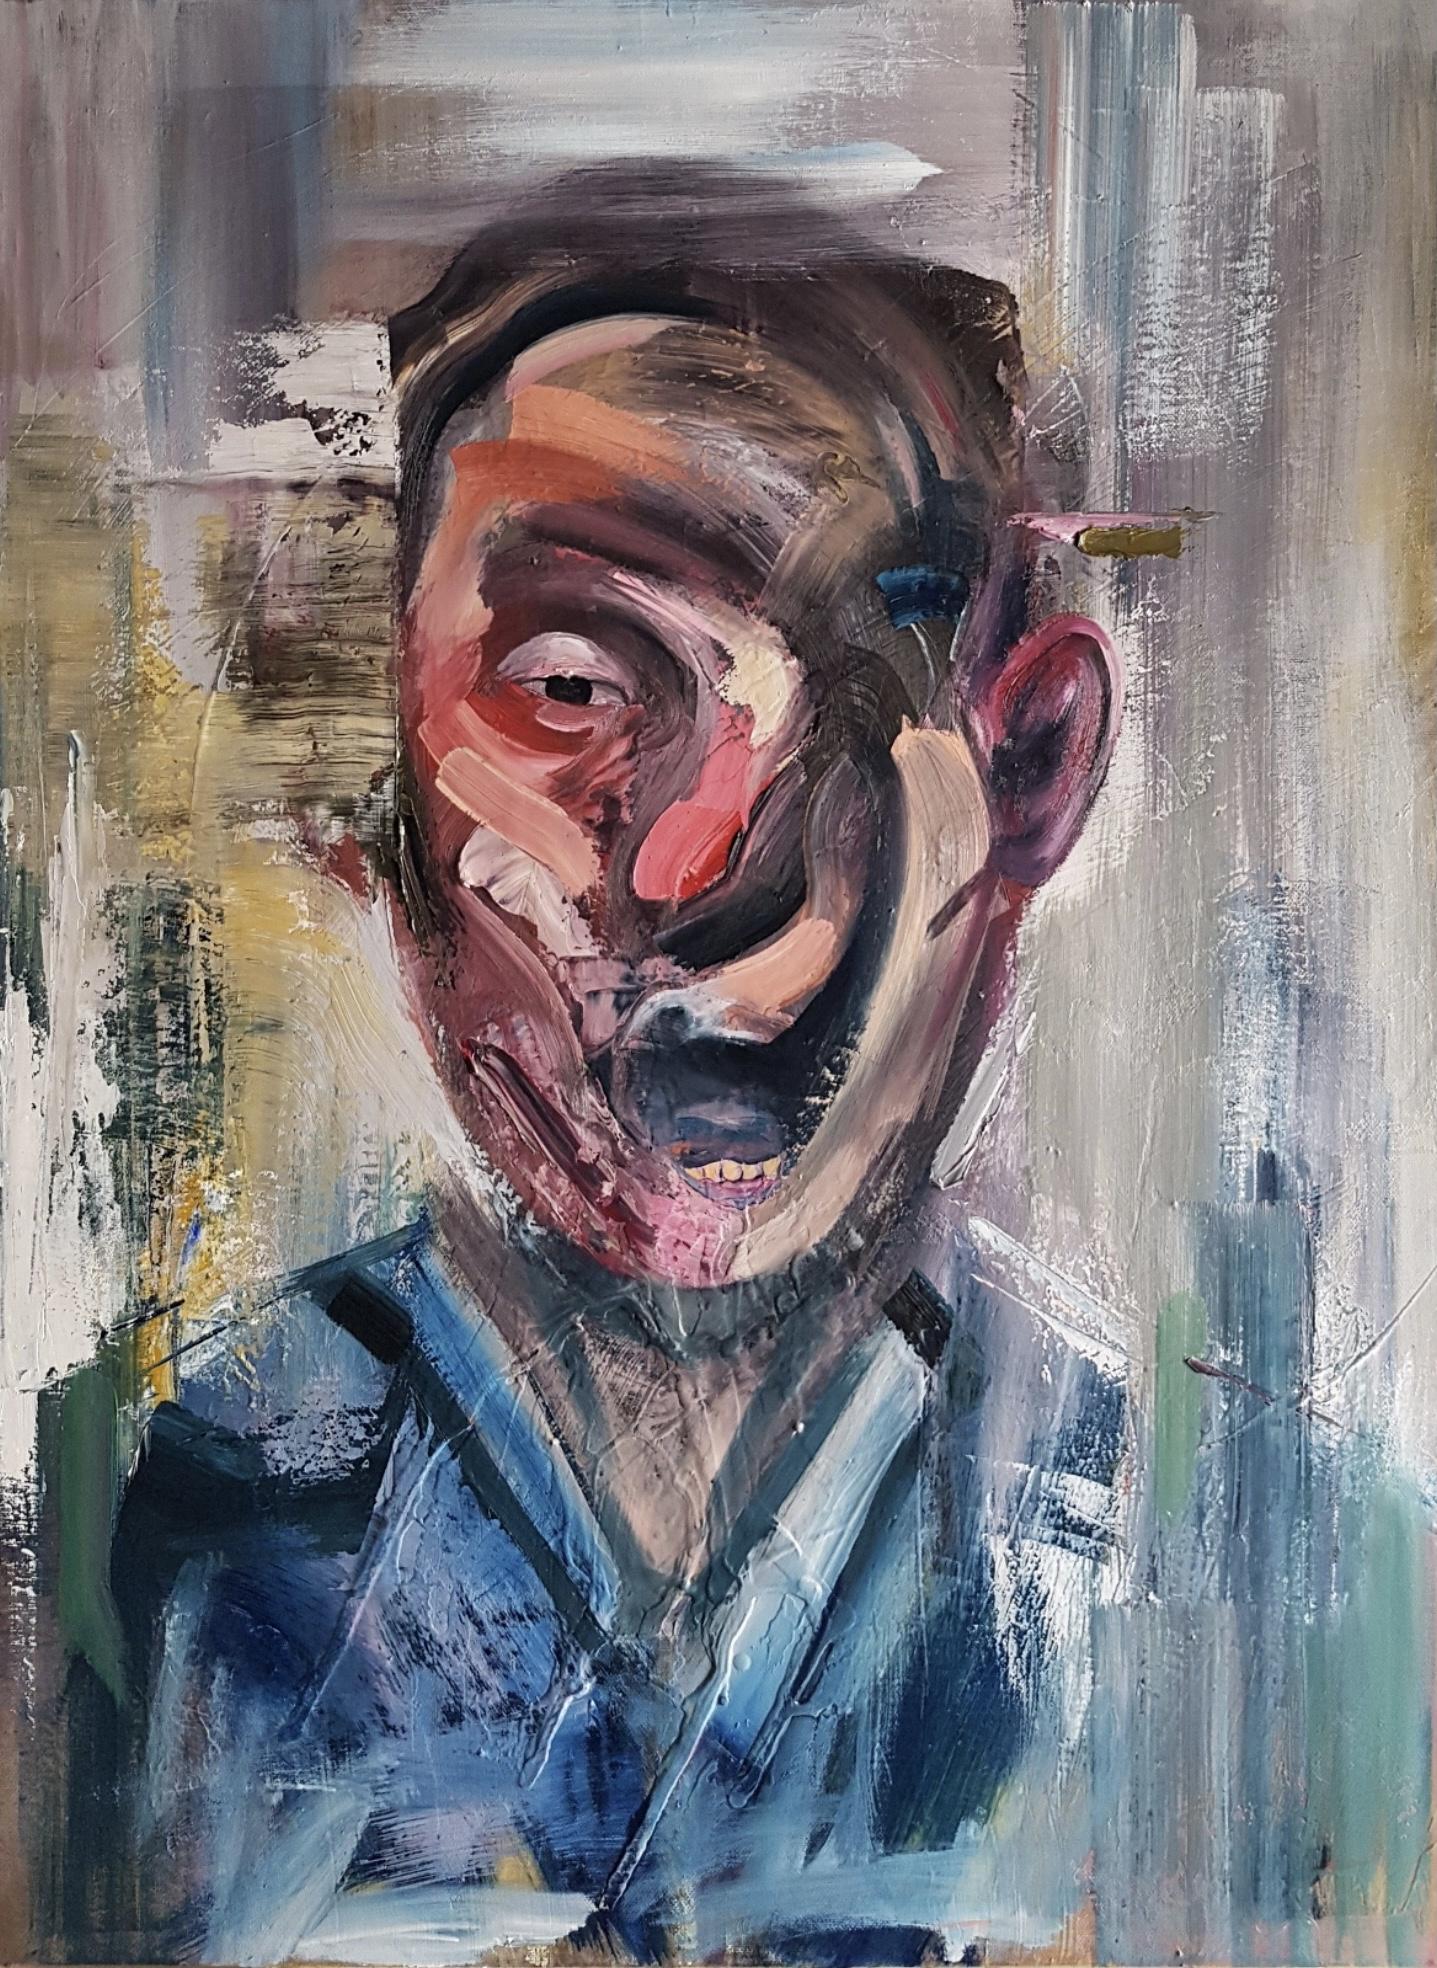 CHRIS VASILEIADIS 'HUMANITY' - 2020 - ORIGINAL 1/1